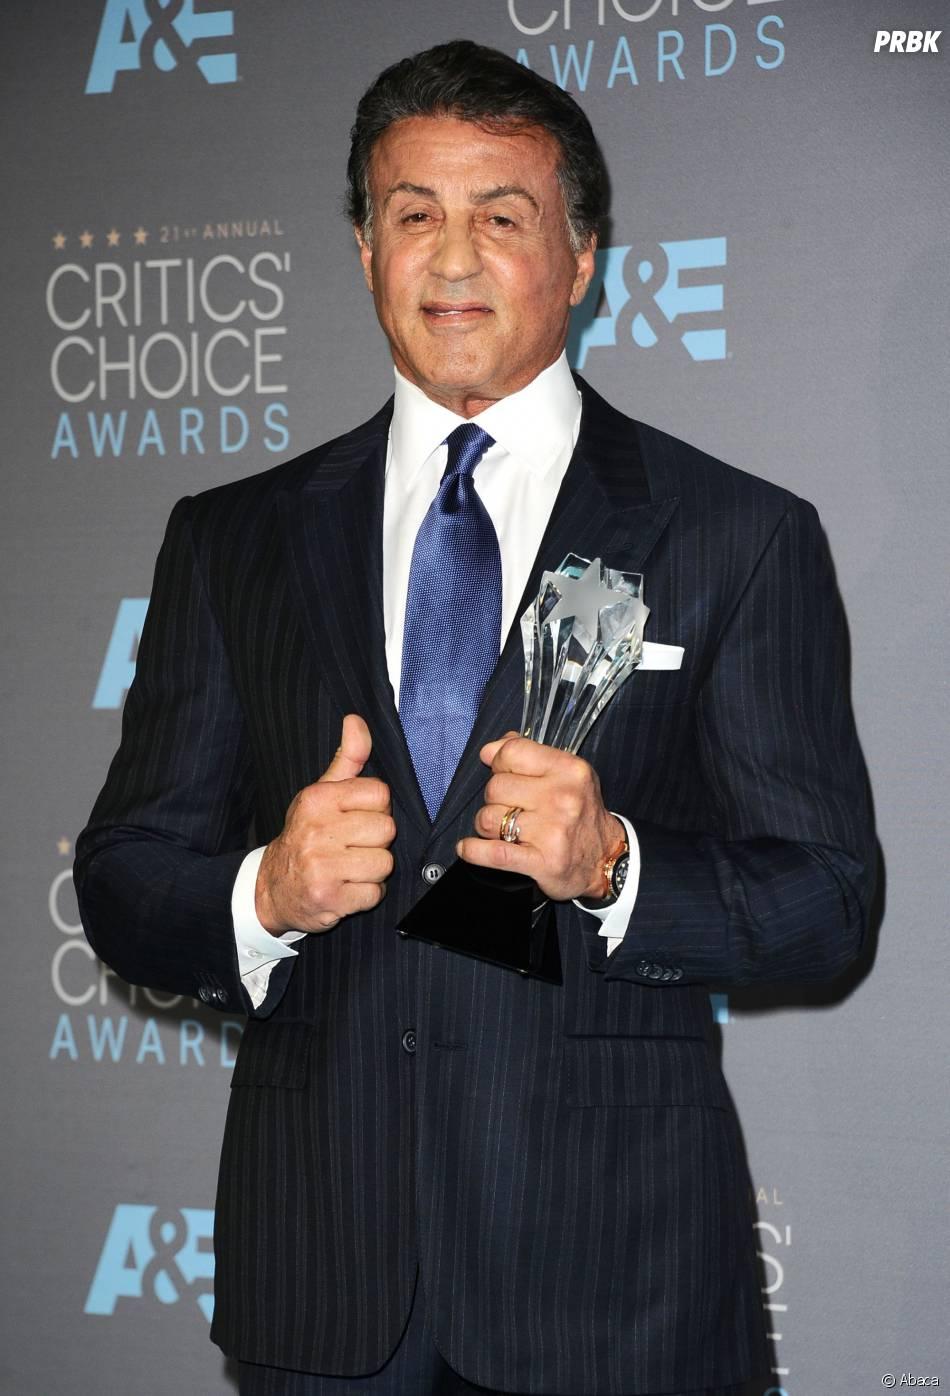 Critics Choice Awards du 17 janvier 2016 : Sylvester Stallone